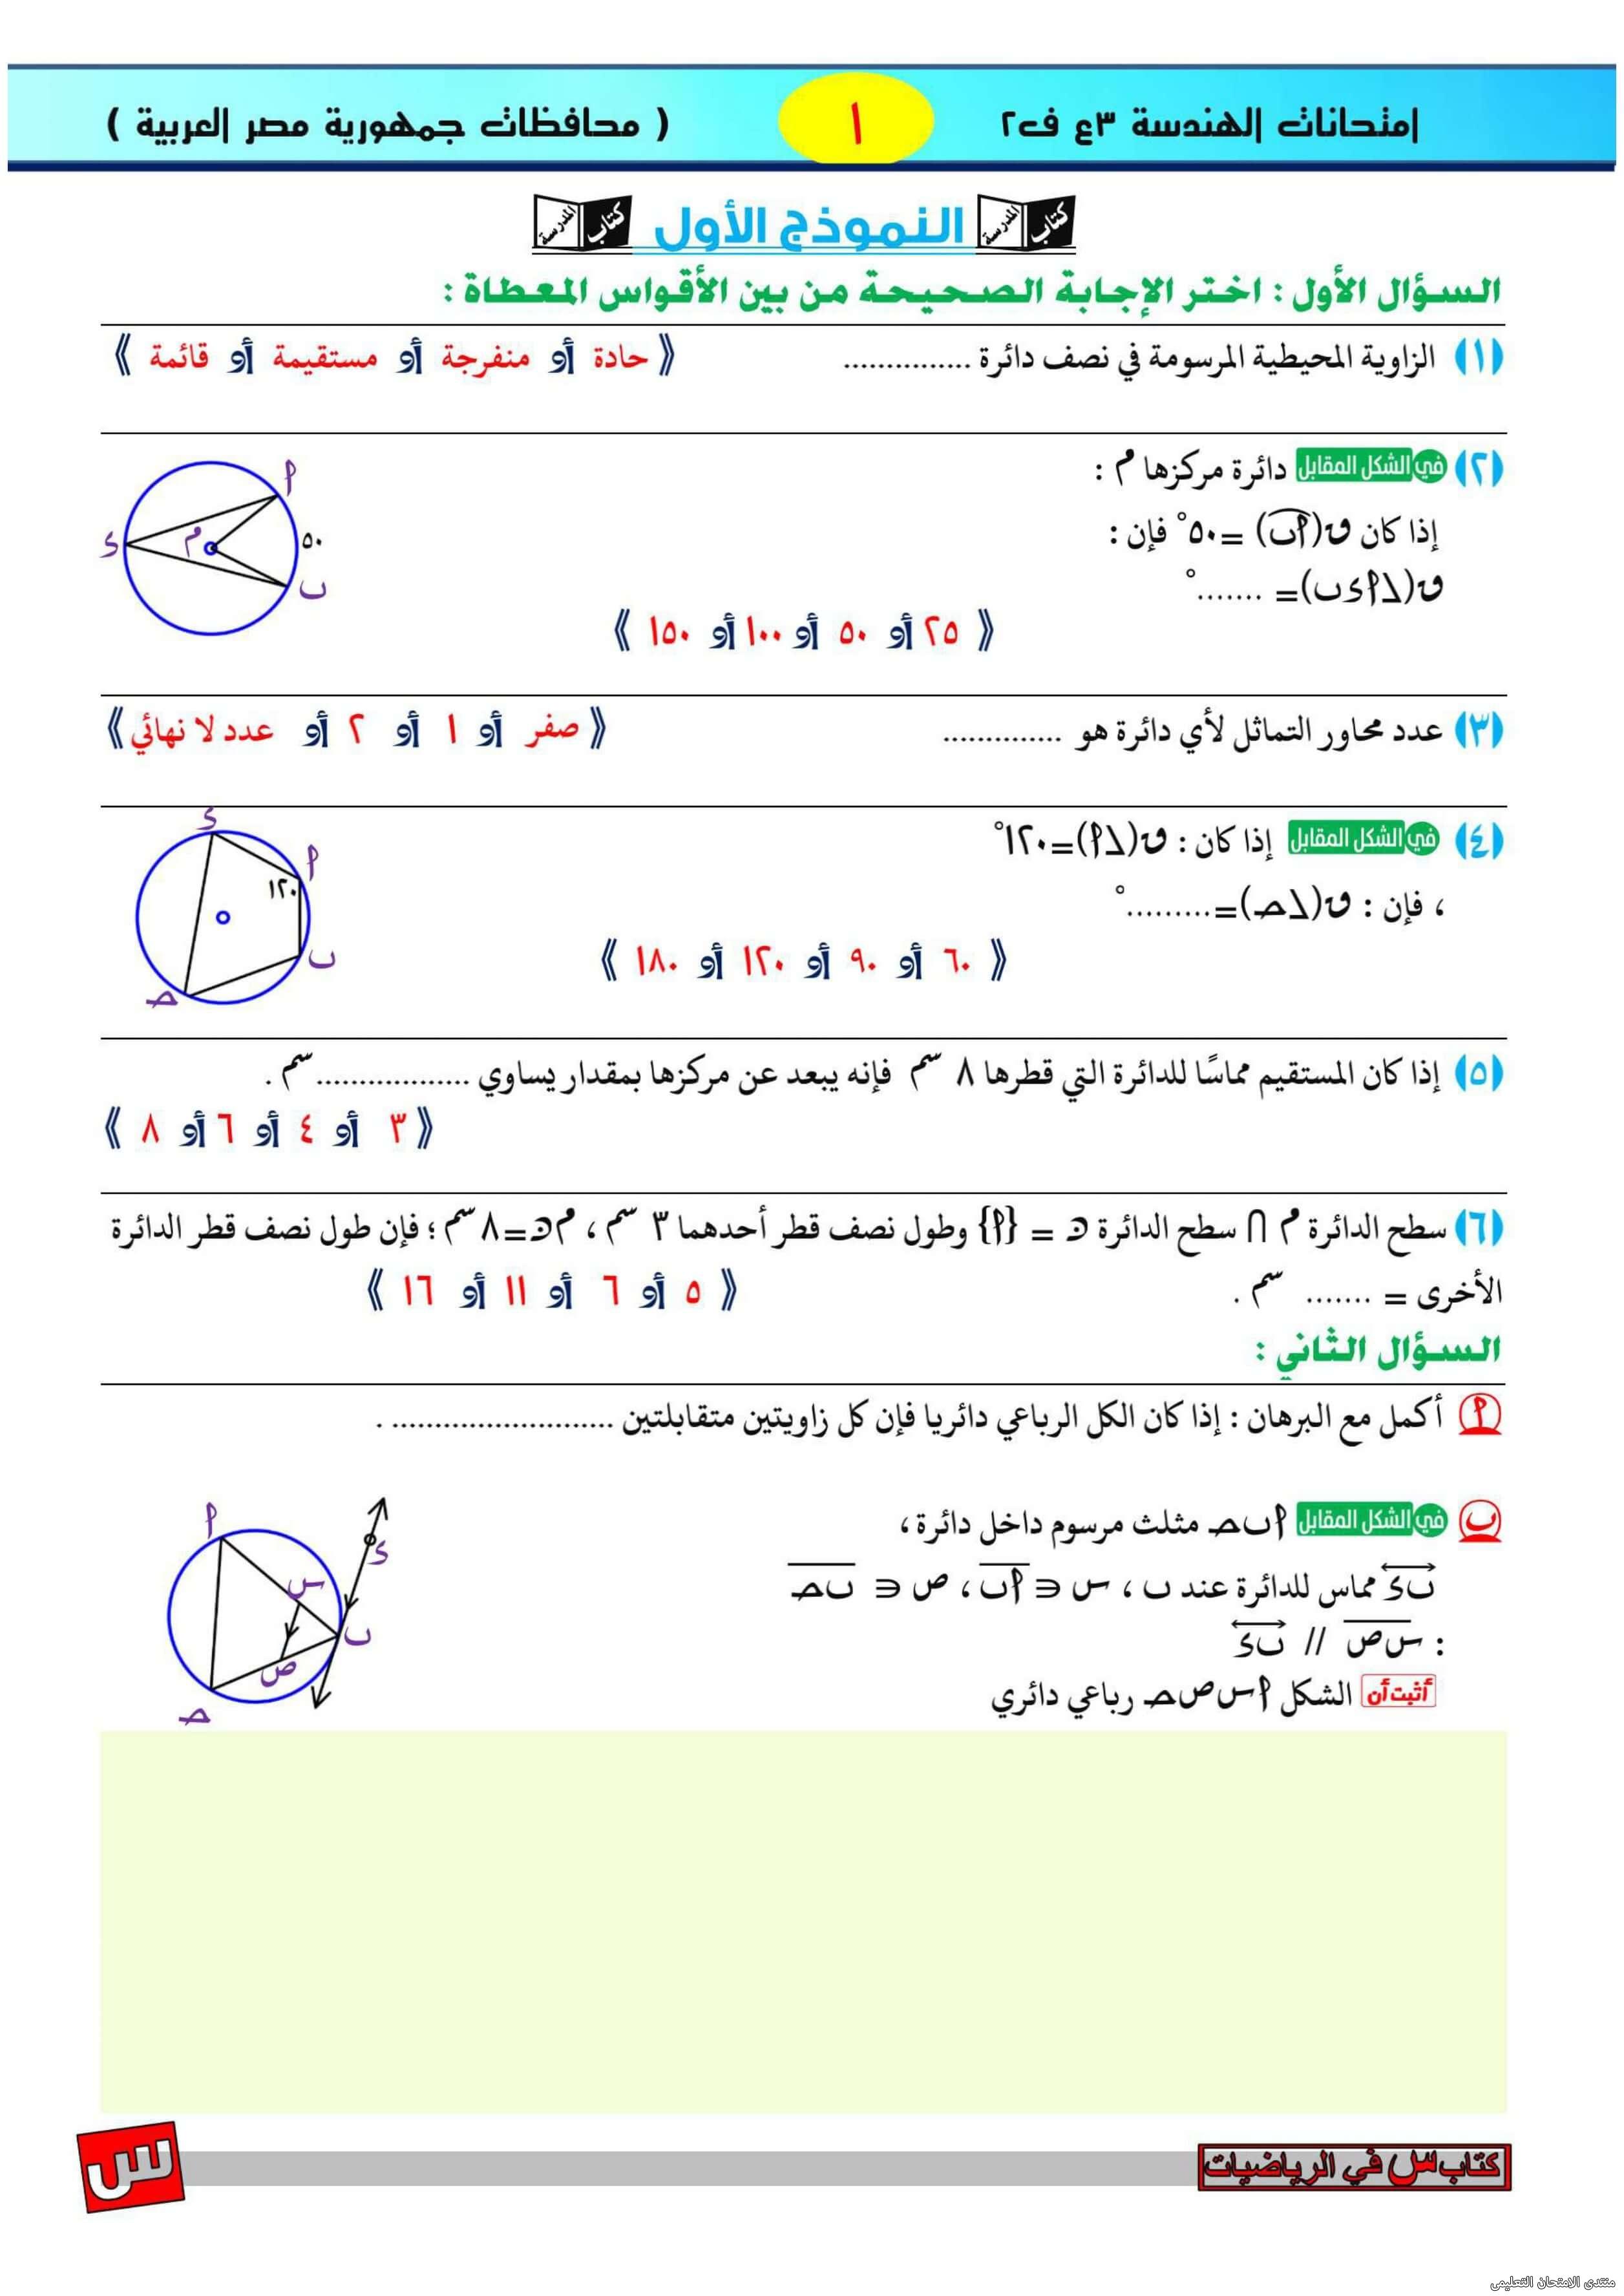 exam-eg.com_162291099047771.jpg